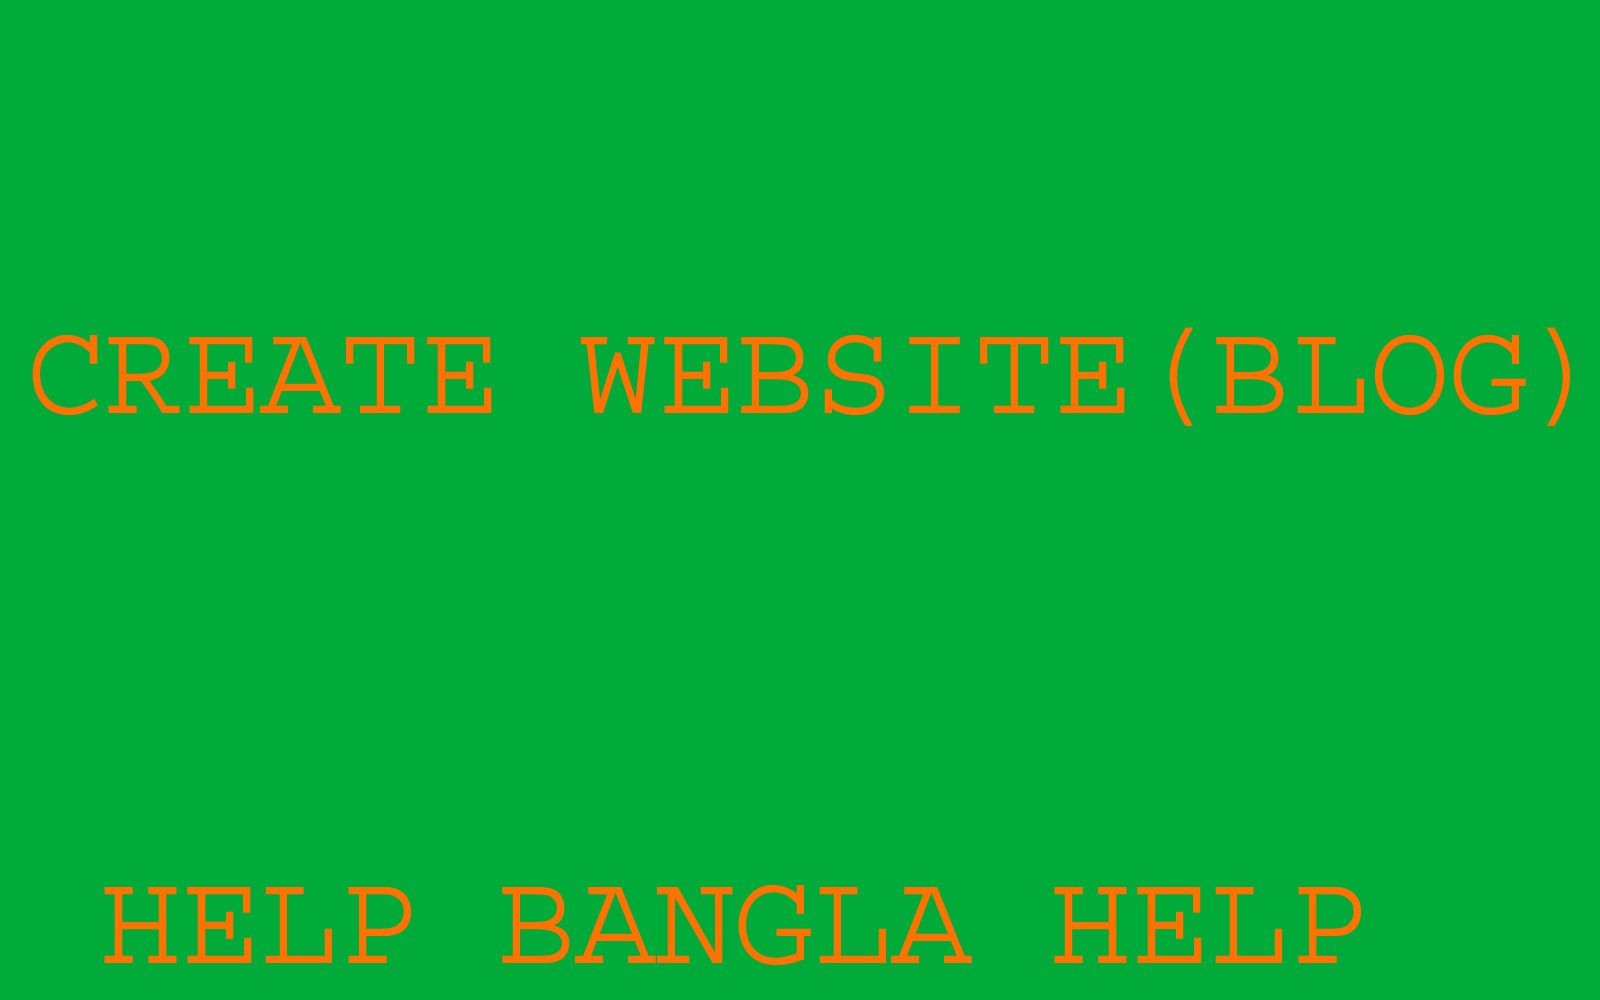 website blog kivabe create kora jai bangla te help help jodi apni apnar business online korte chan othobo nijer knowladge puro world ye online share korte chan tobe apnar website blog thaka dorkar